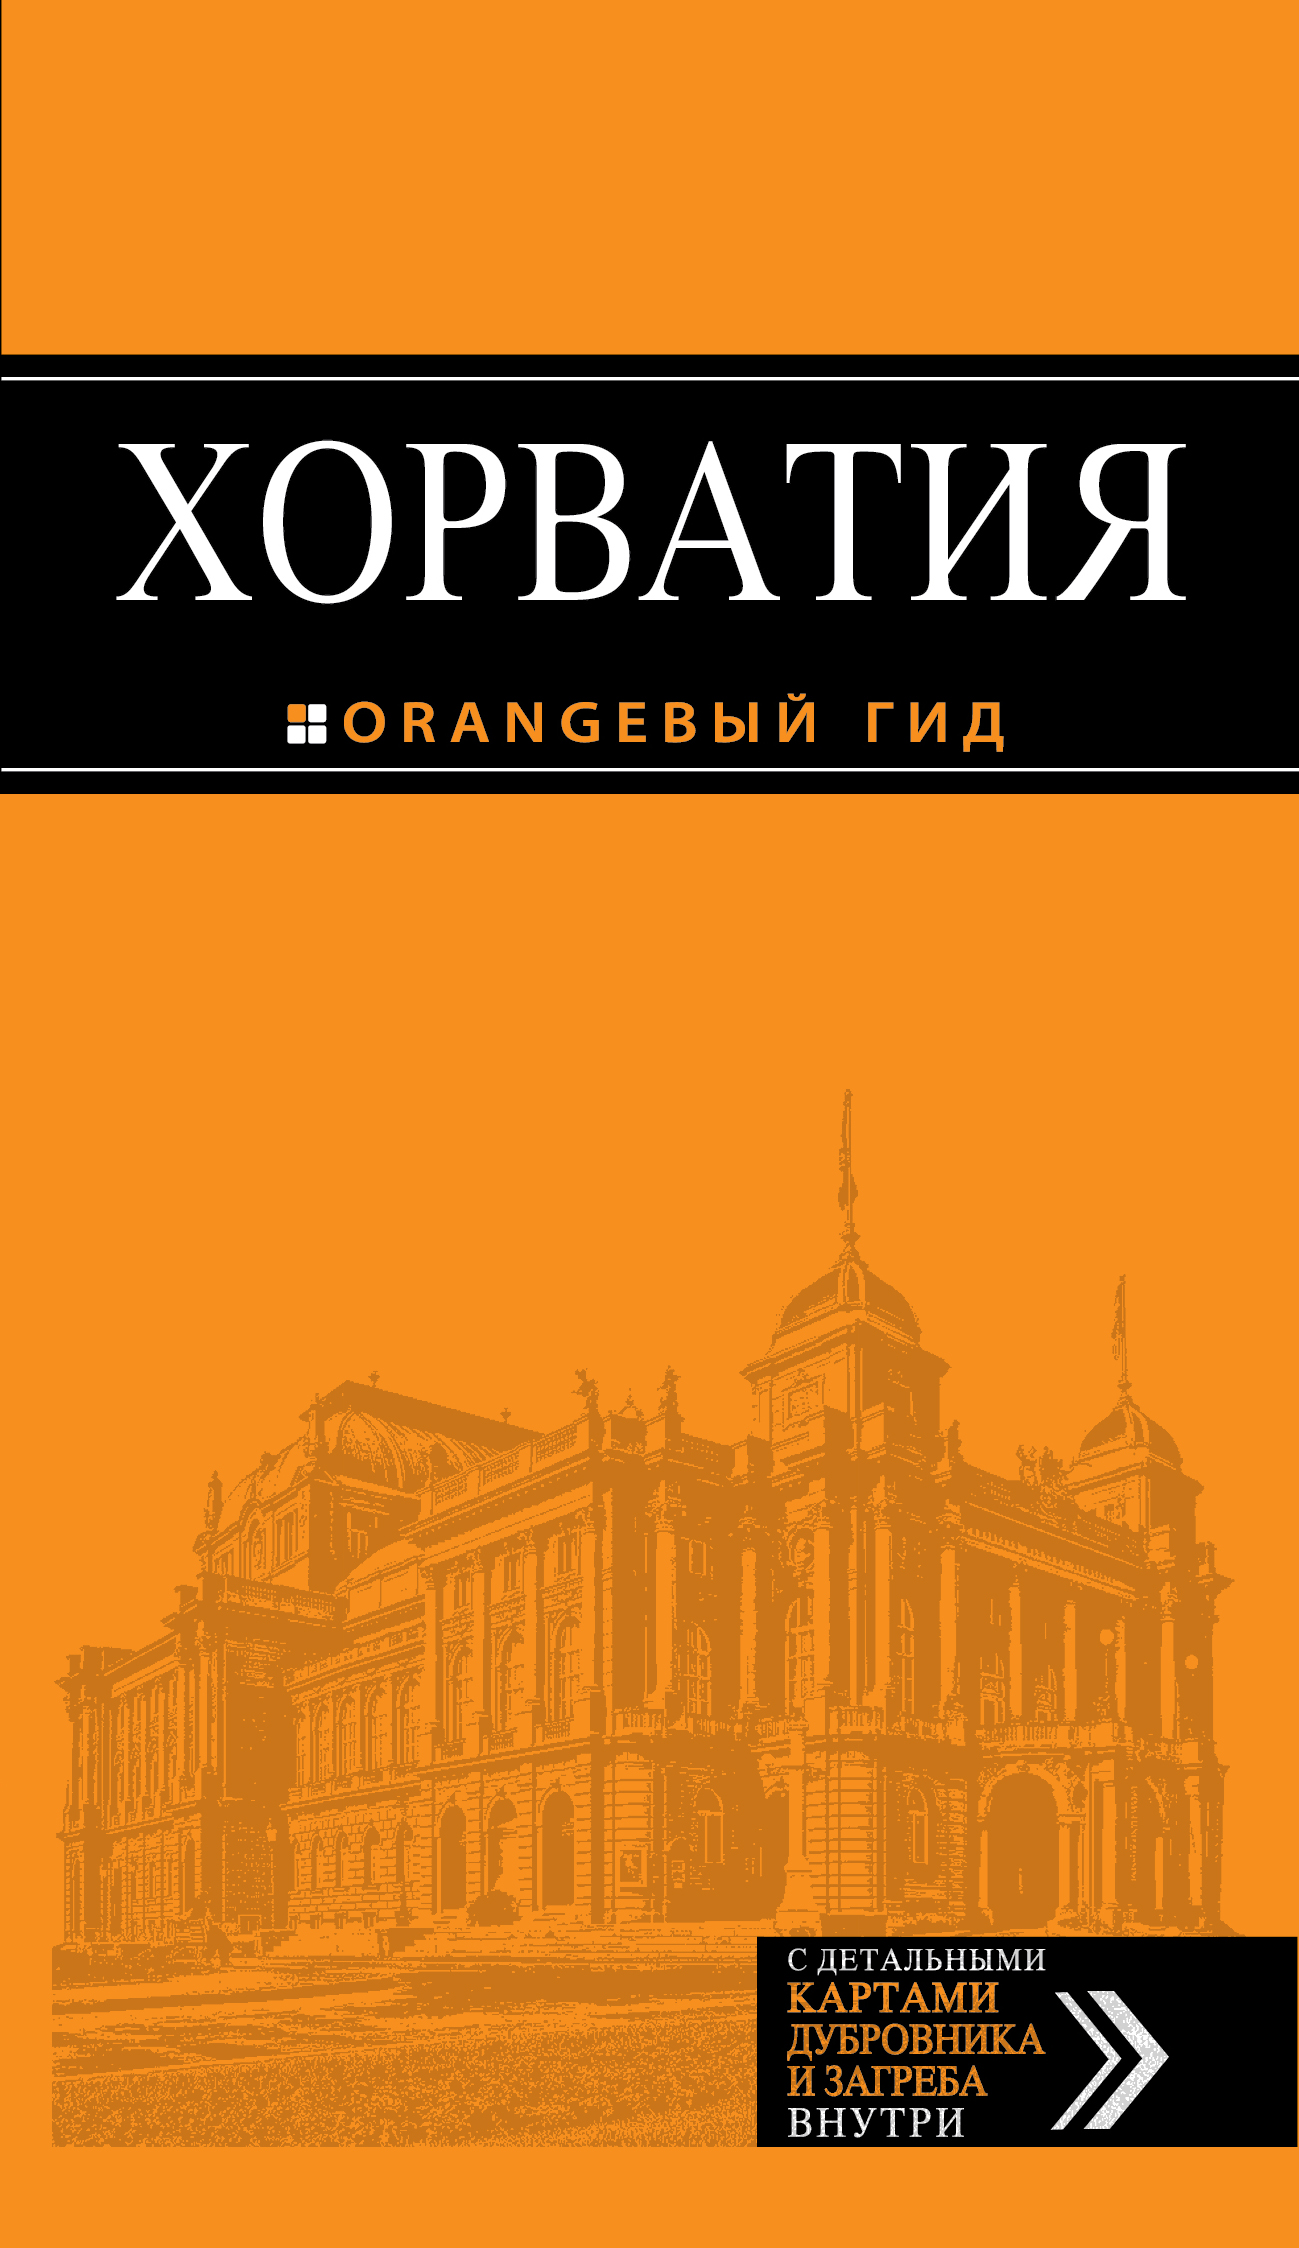 Богданова Е.В., Марушич Н., Хасанова Л.Р. Хорватия : путеводитель хорватия с мини разговорником